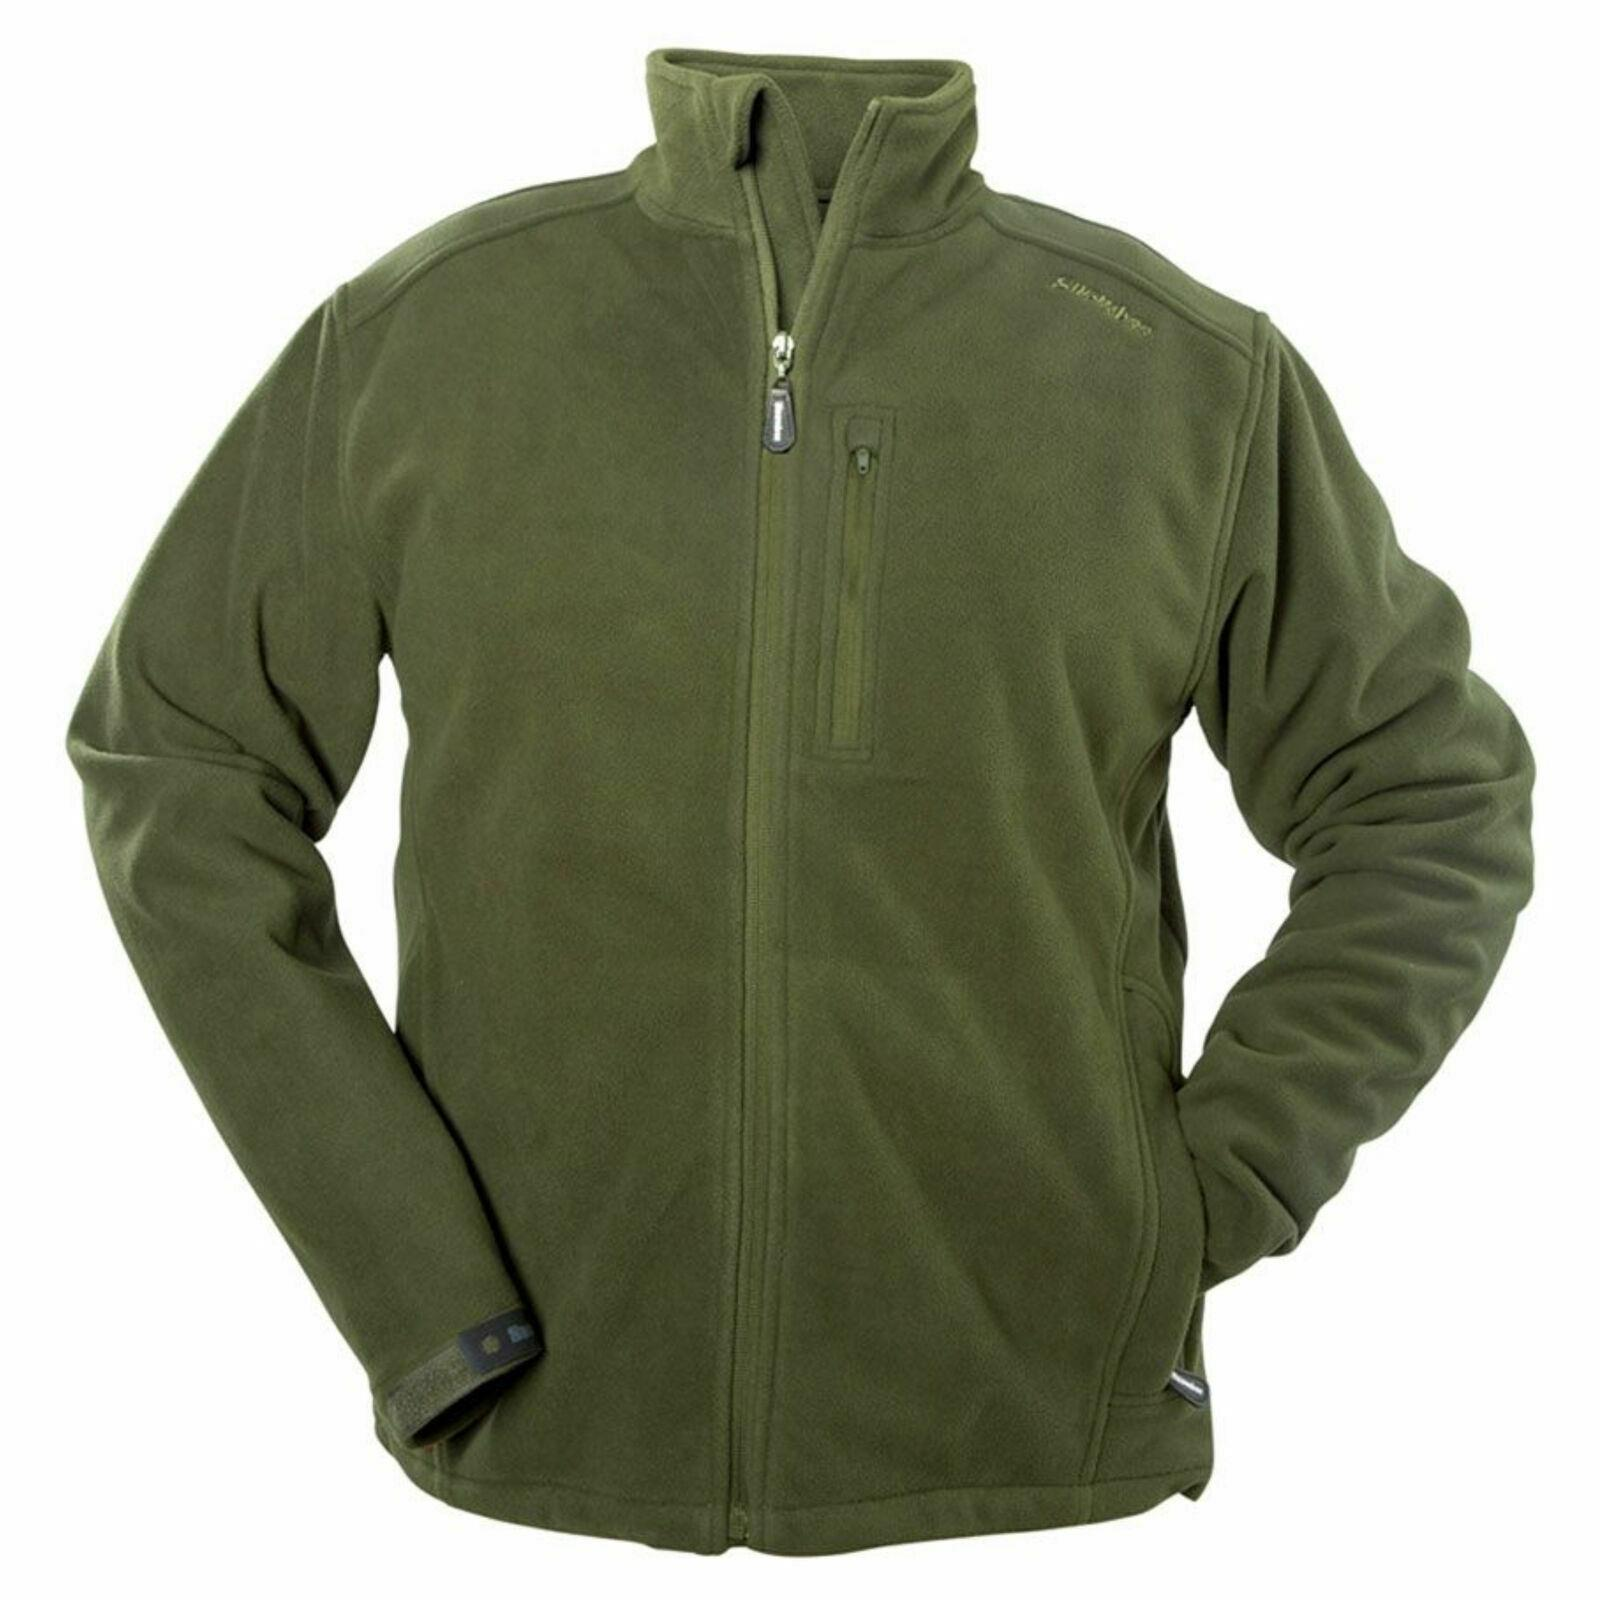 Hunting// Fishing// Walking// Outdoors Green *Deerhunter Eager Fleece Jacket